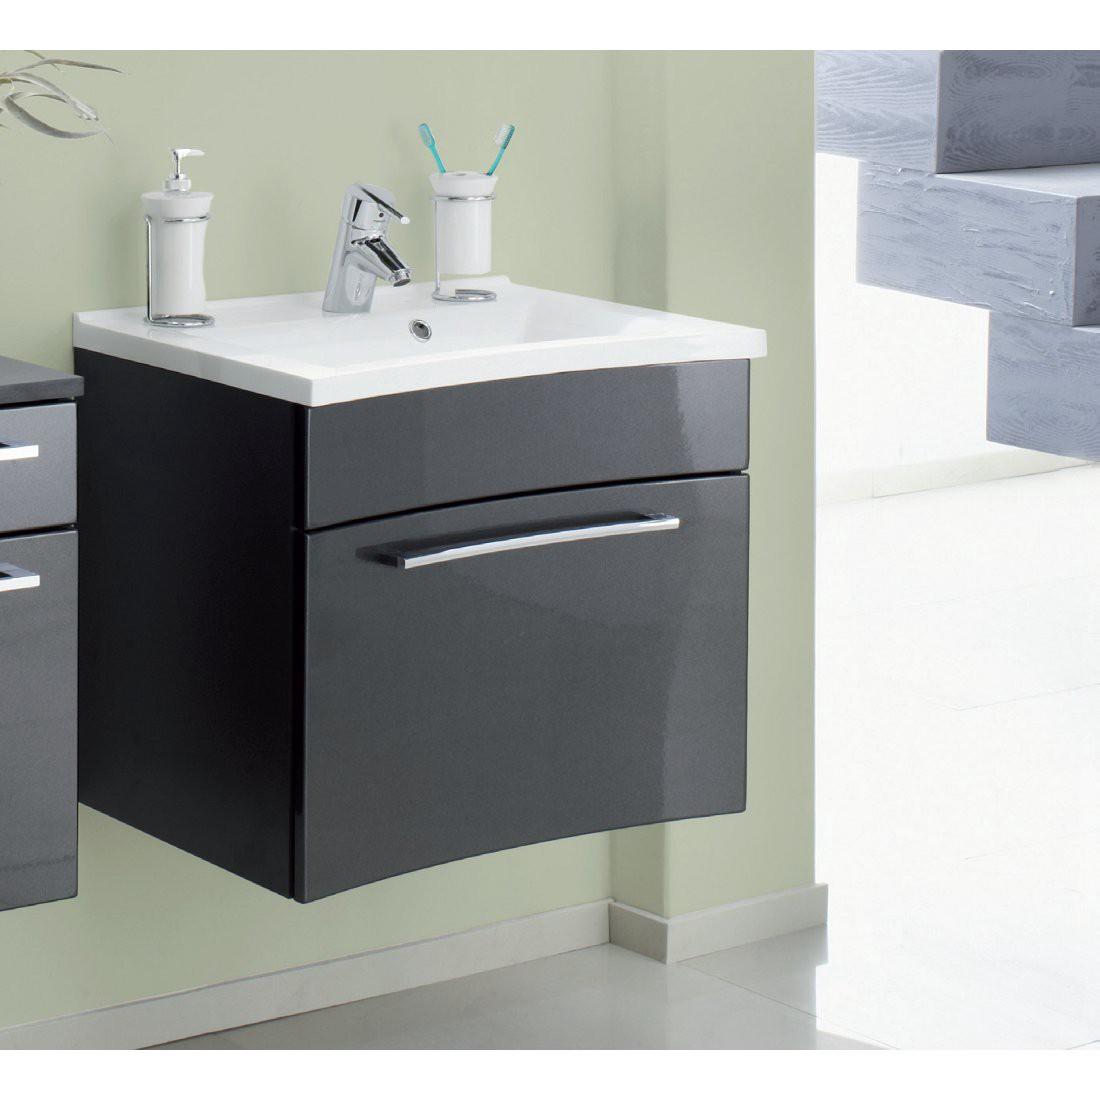 Waschplatz Fontana – klein – Walnuss-Nachbildung-Weiß, Aqua Suite bestellen